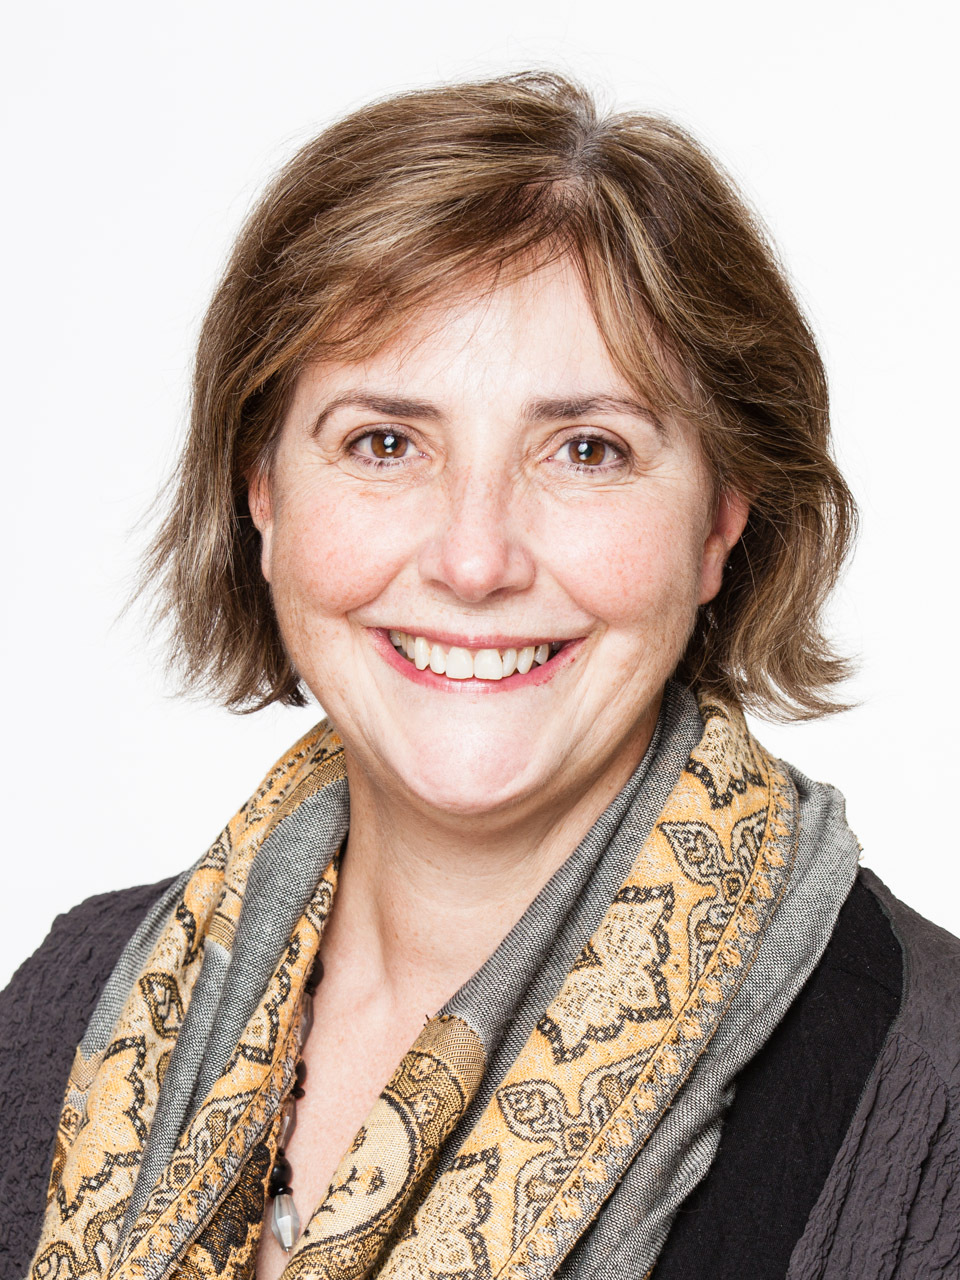 Profile picture of Alison Inglis